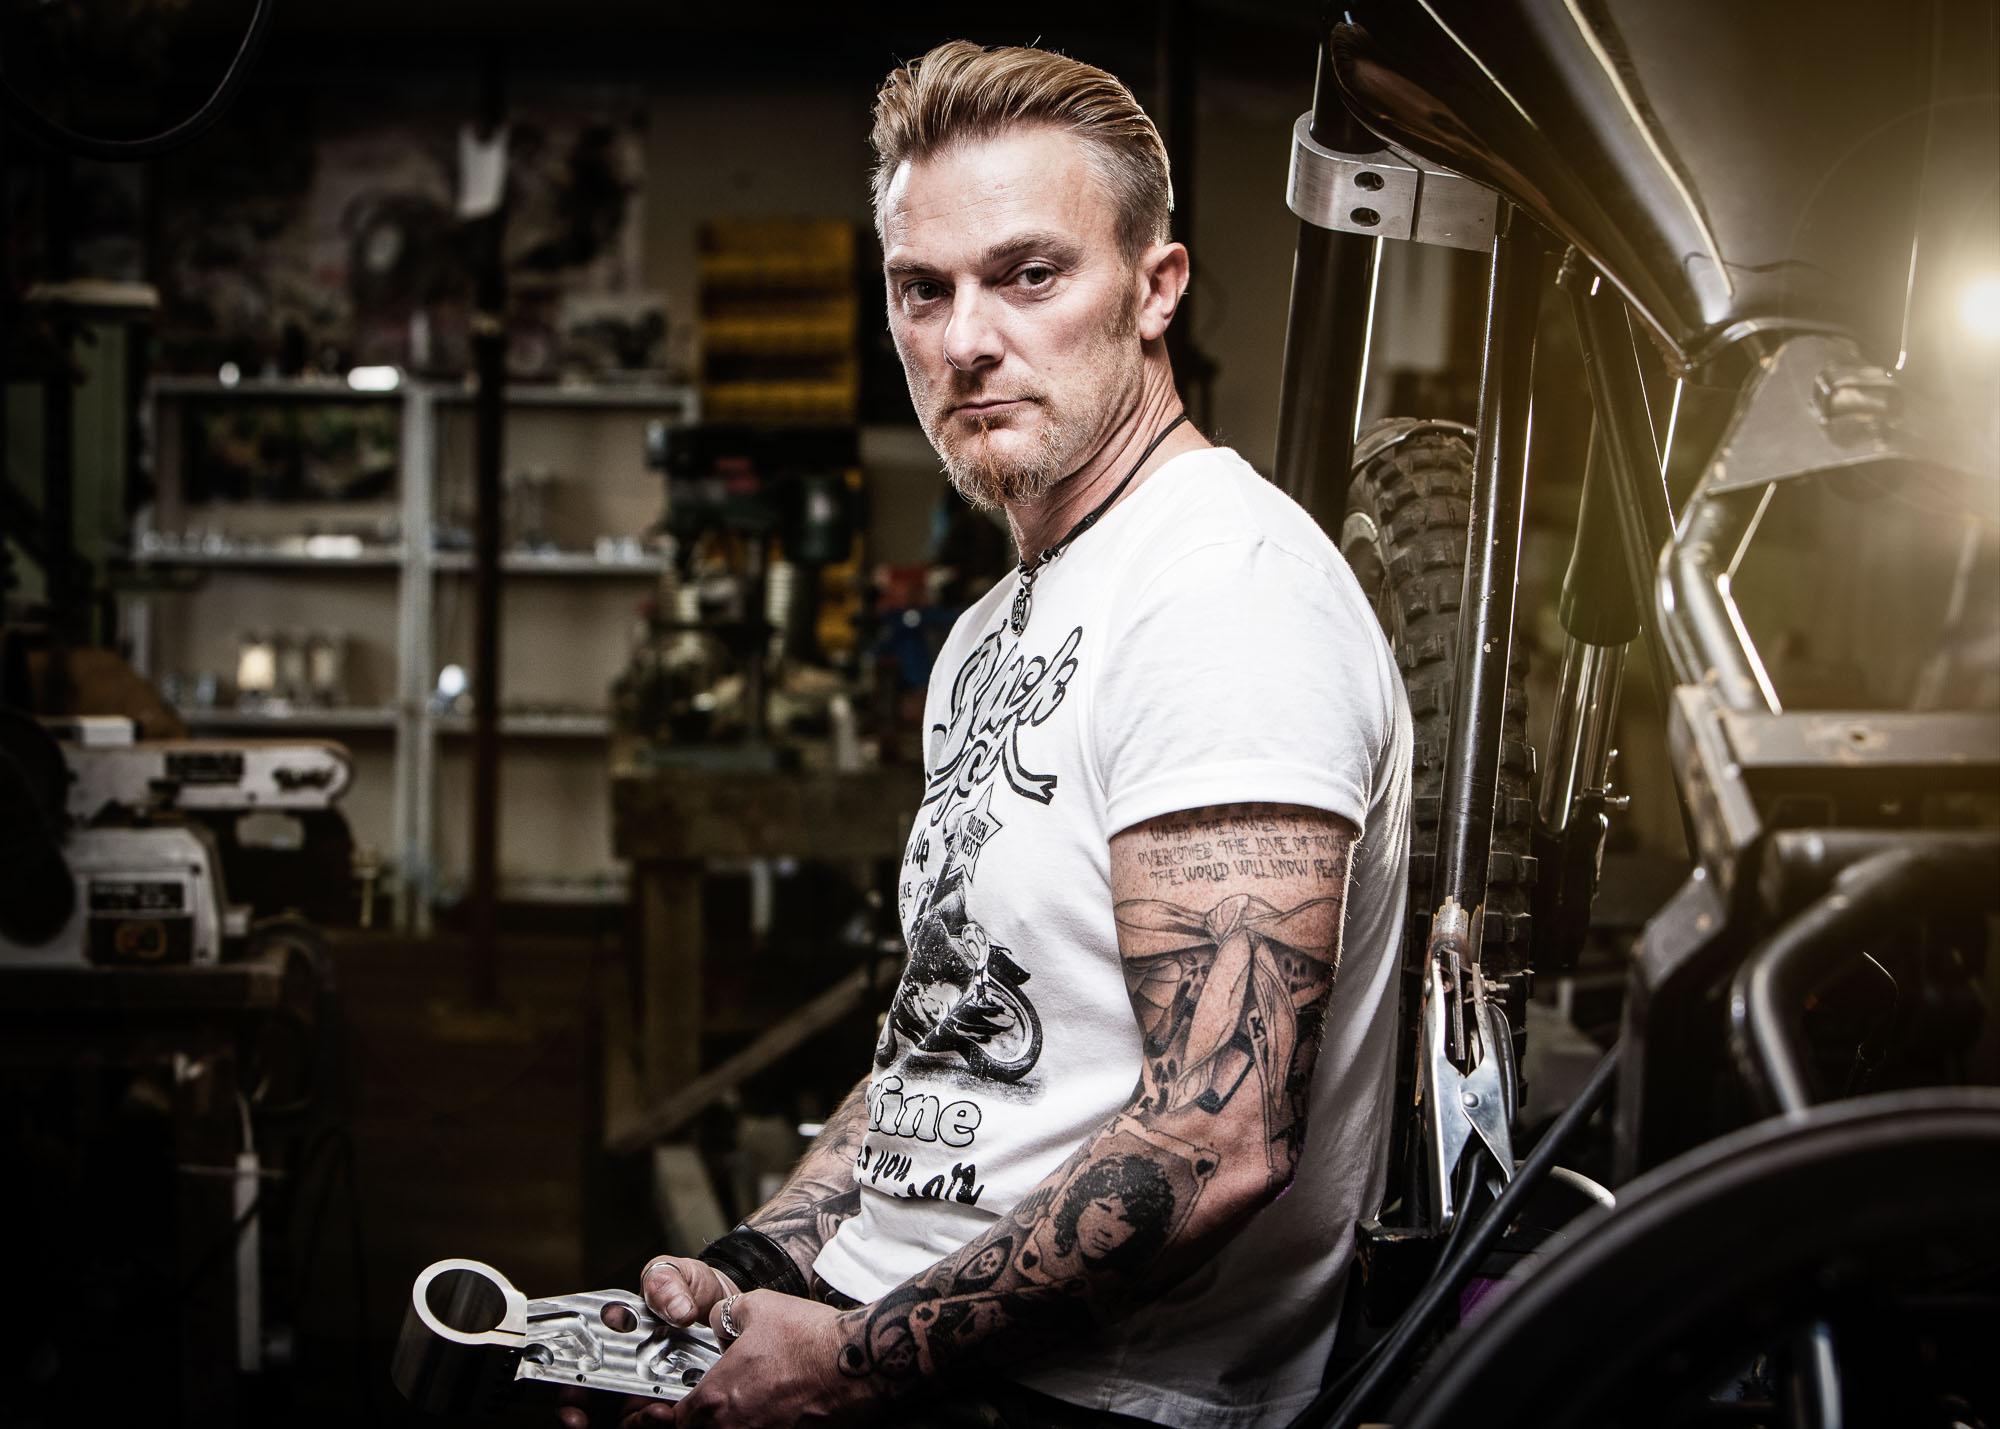 Tim Platt - Portrait of man in work studio